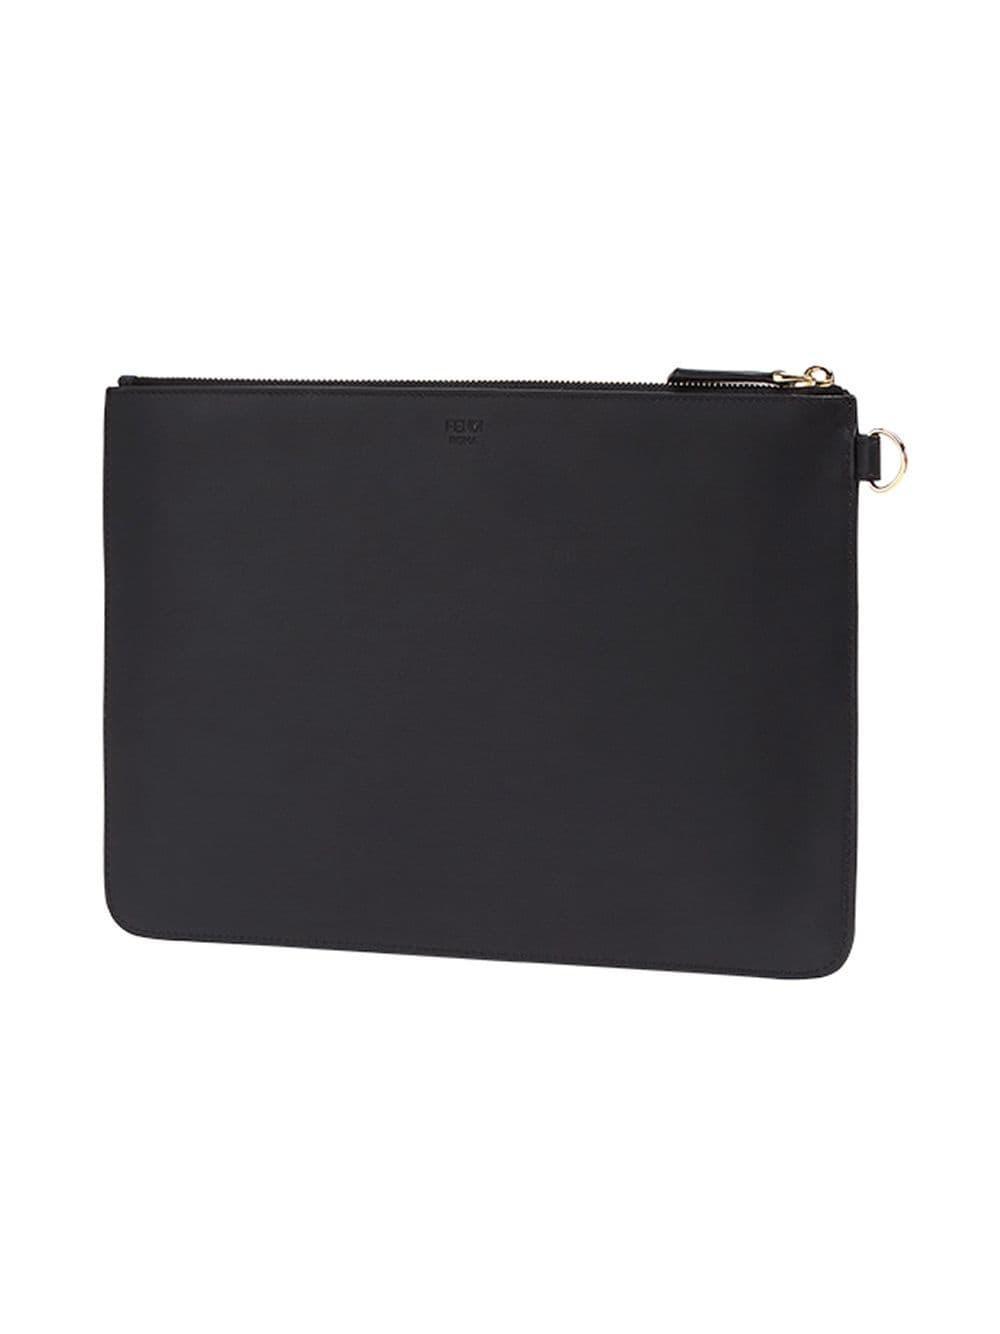 fa2a5b50f95b Lyst - Fendi Bag Bugs Leather Pouch in Black for Men